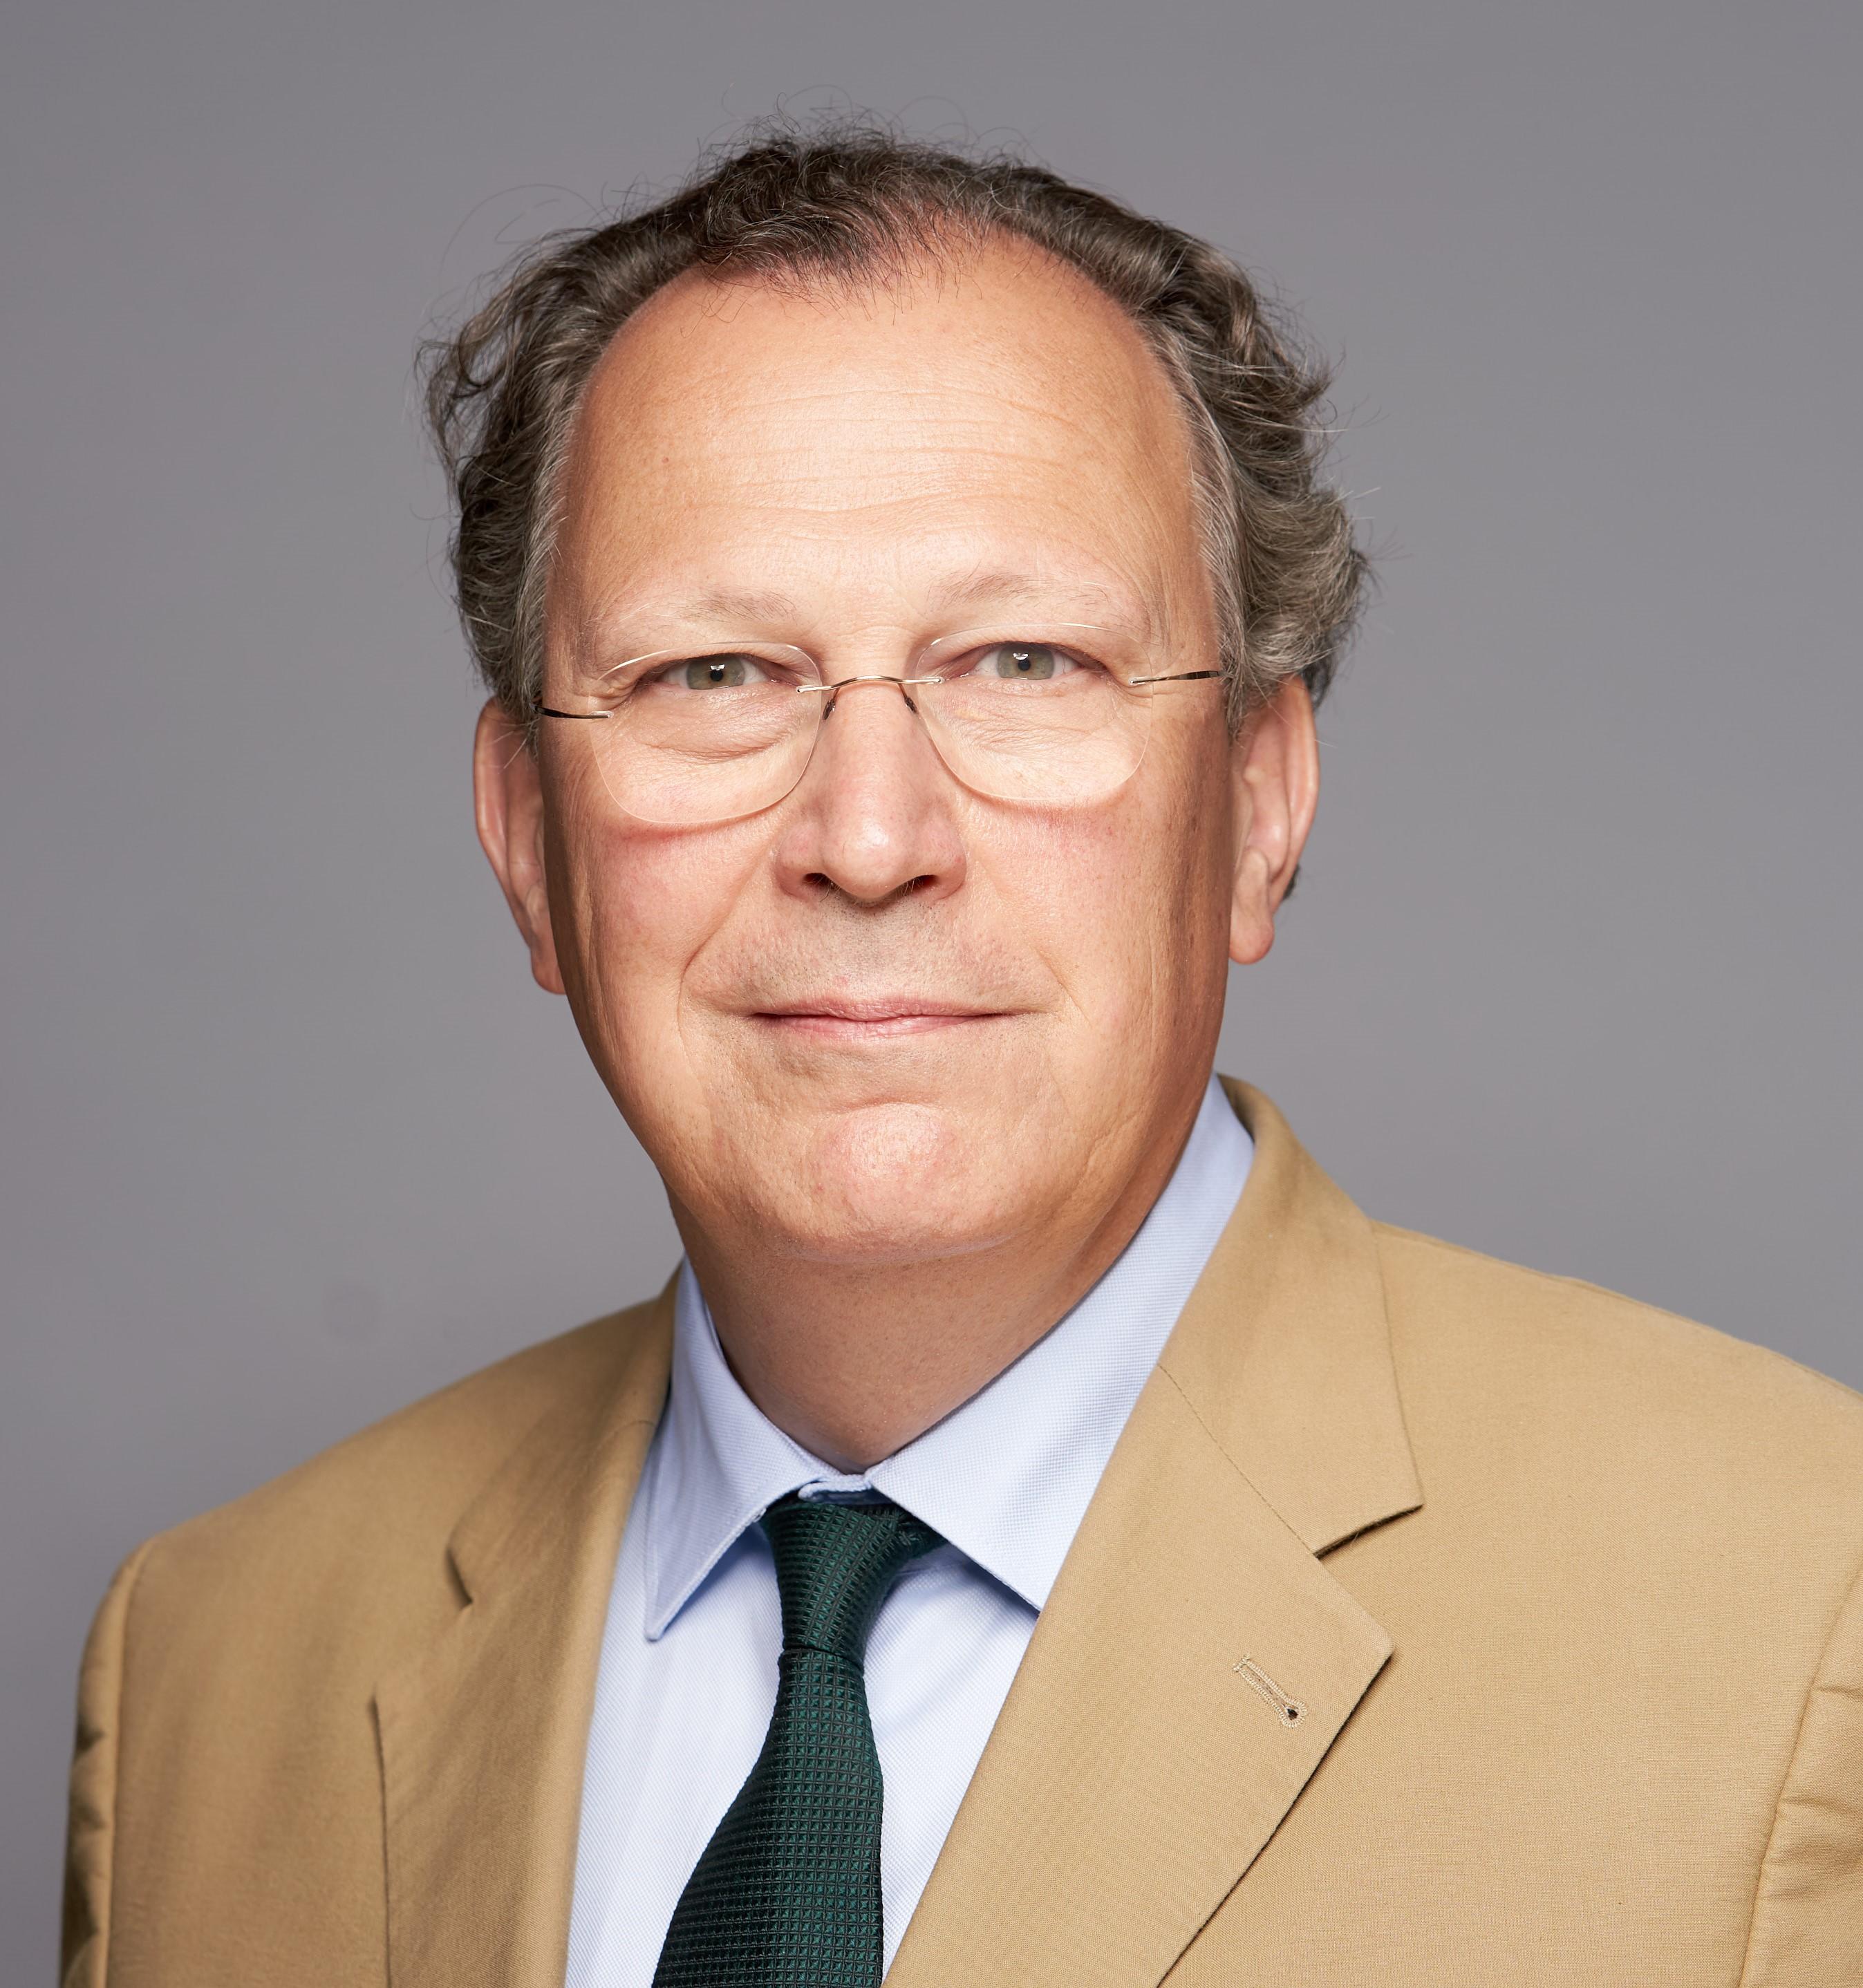 Dr. Ruprecht Brandis